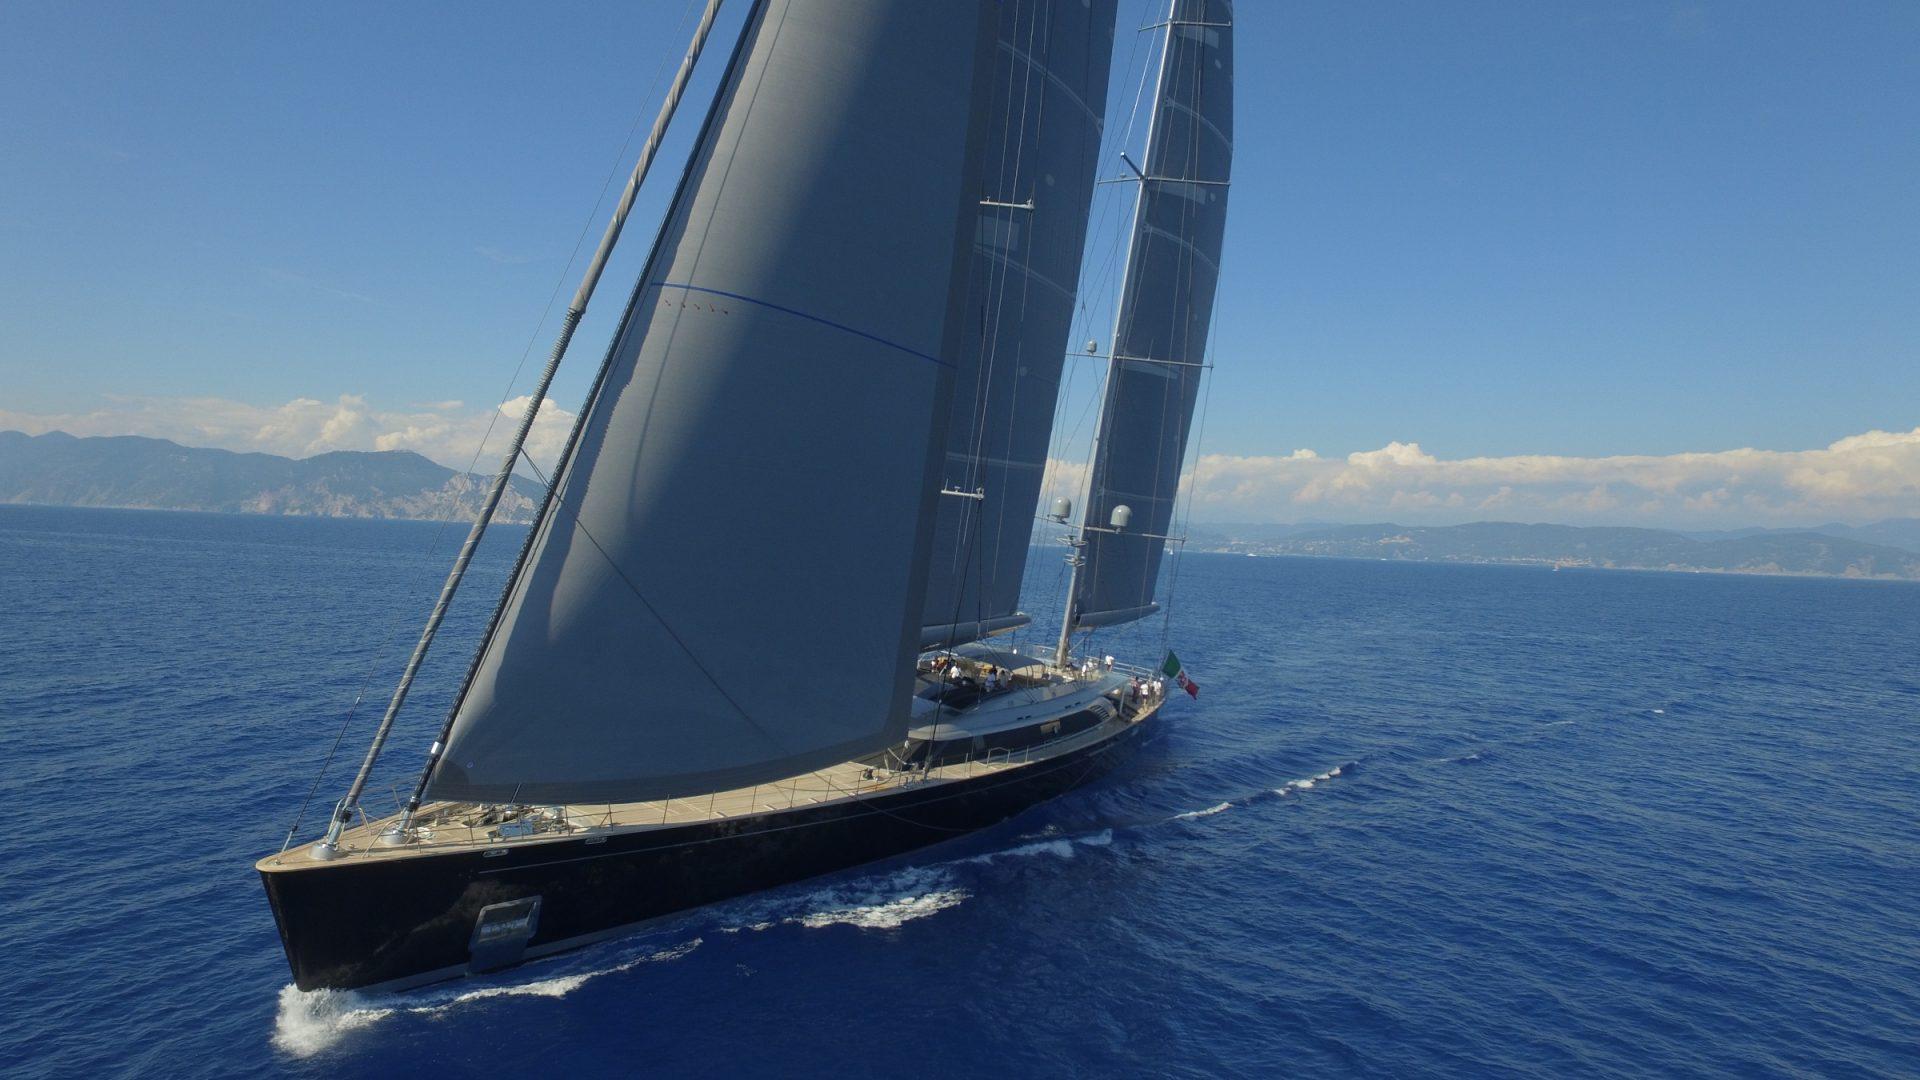 SYBARIS yacht Charter Brochure